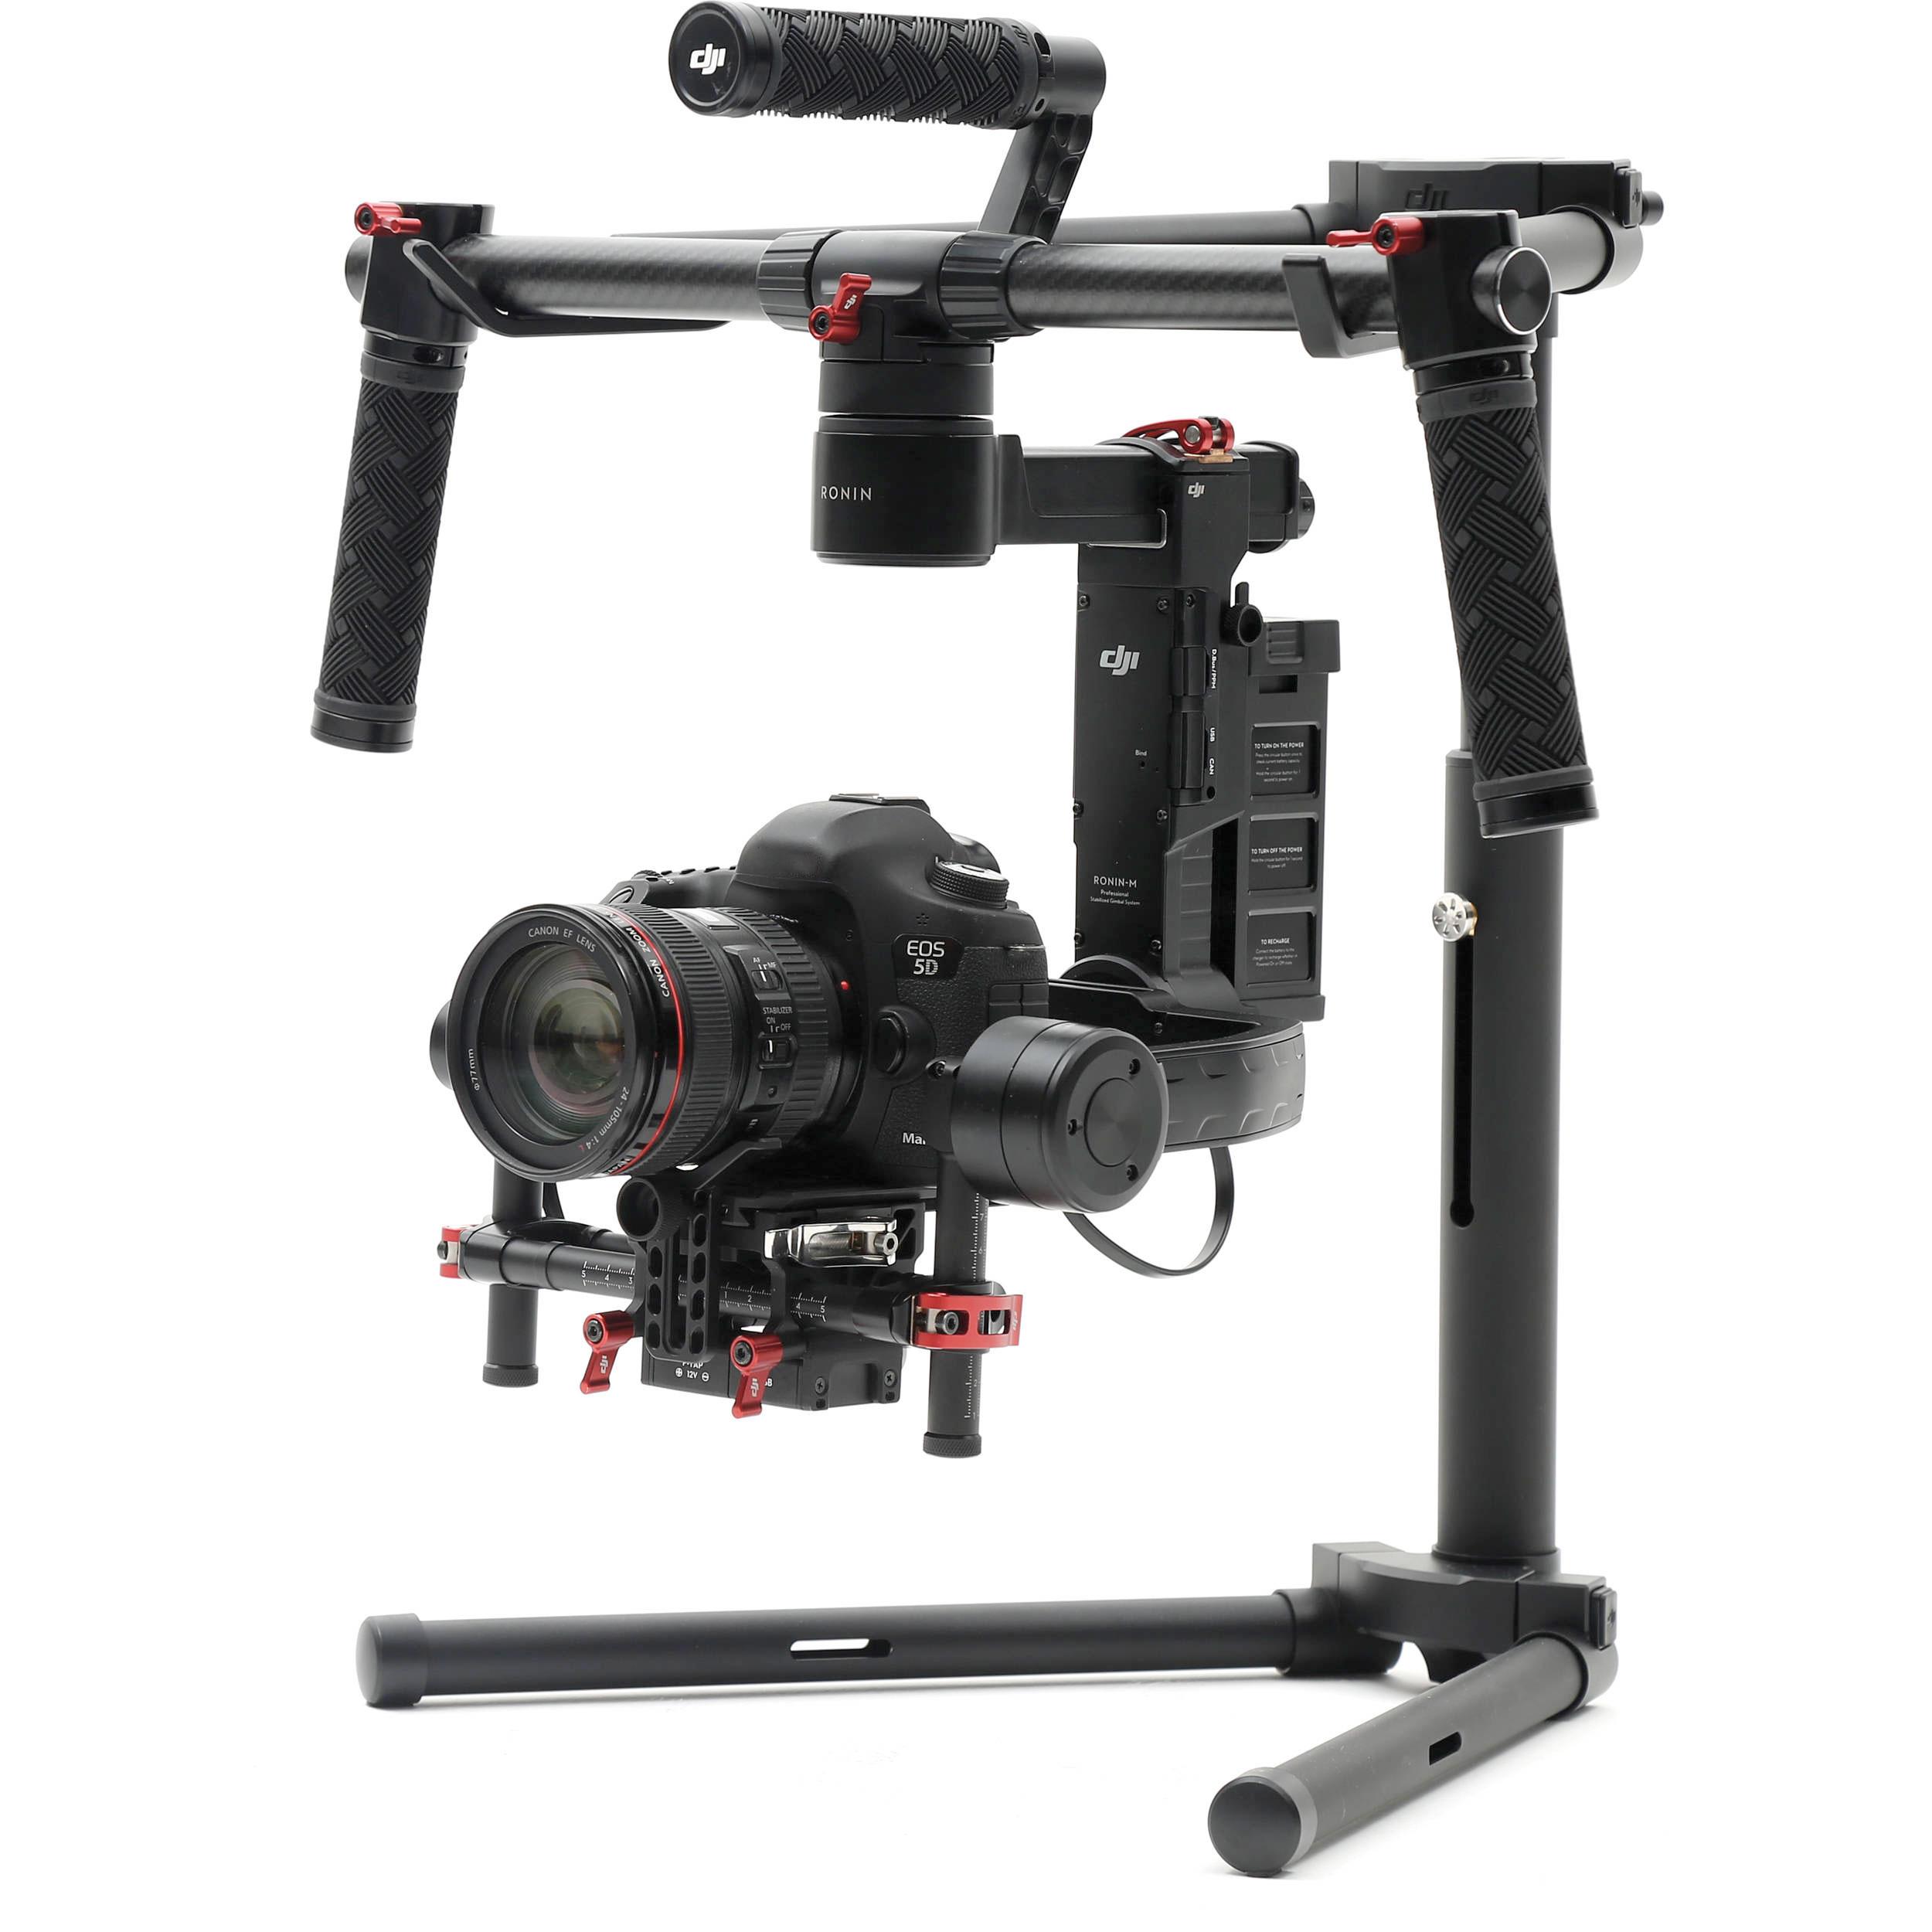 [RENT]DJI Ronin-M 3-Axis Handheld Gimbal Stabilizer